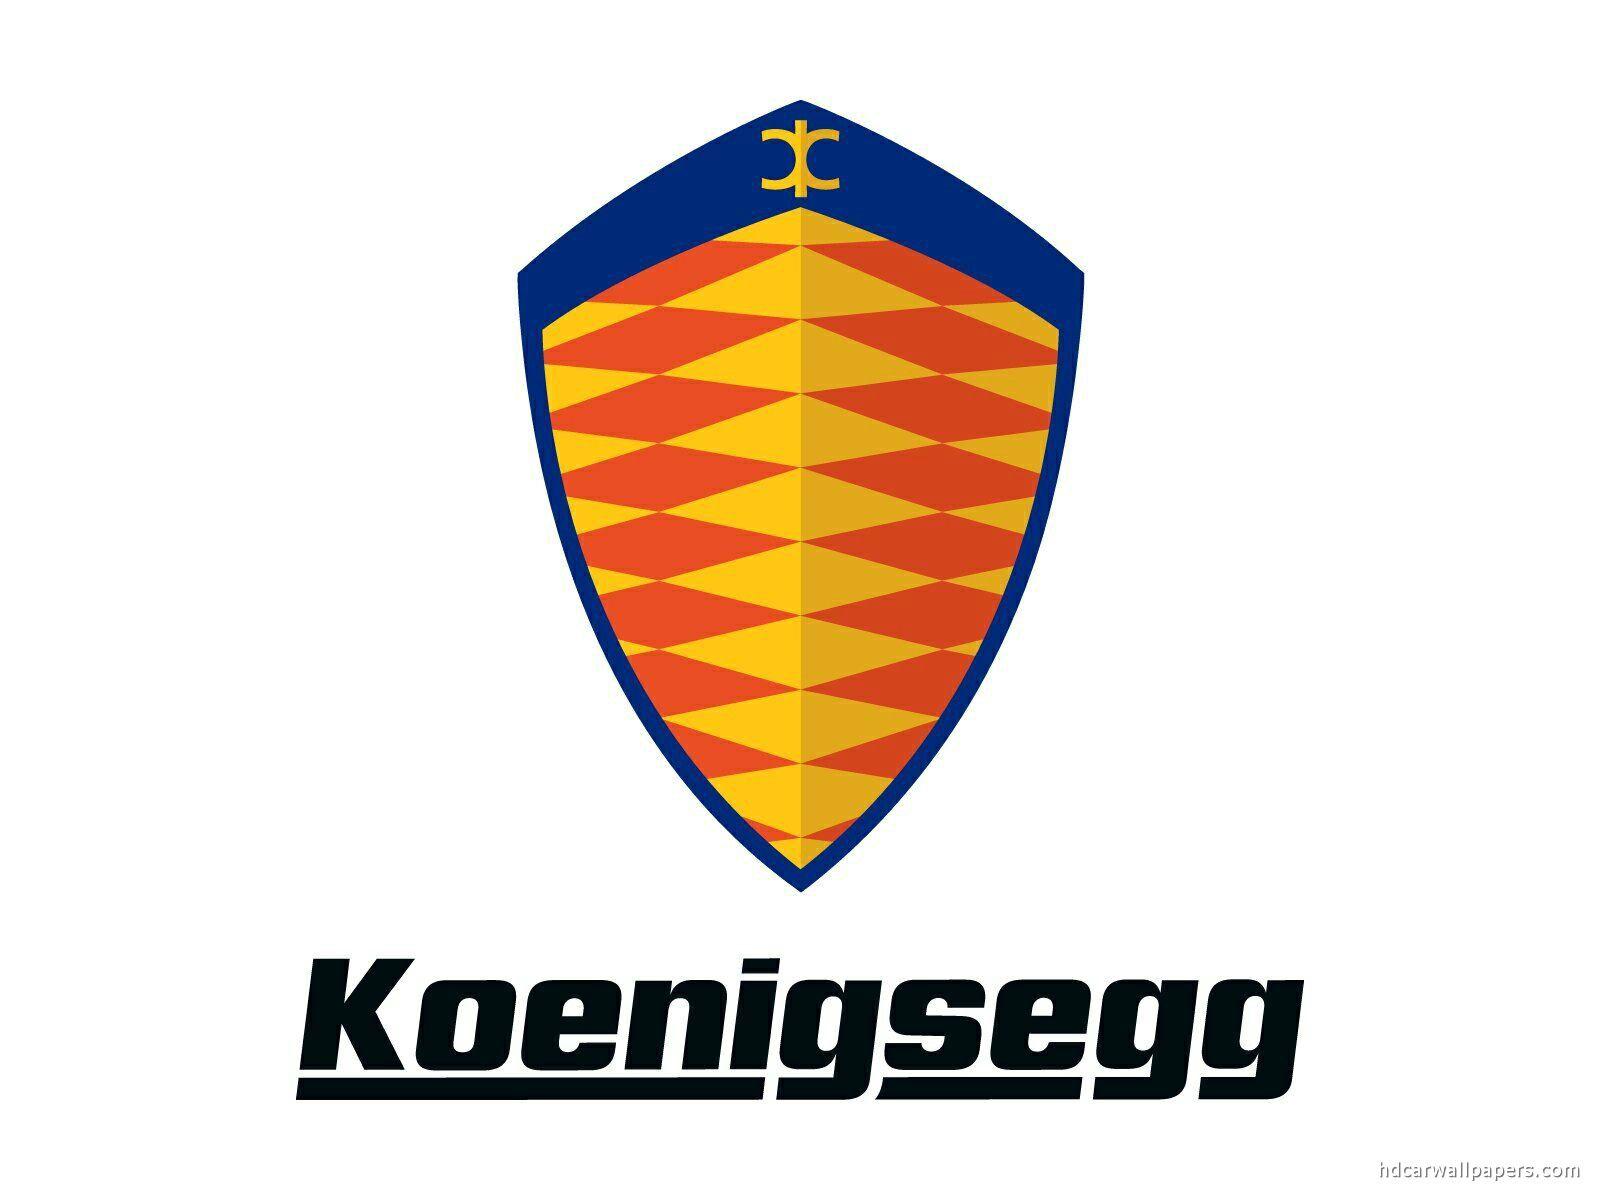 koenigsegg logo for you hd and free desktop koenigsegg logo on rh pinterest com au hd logos download hd logistics